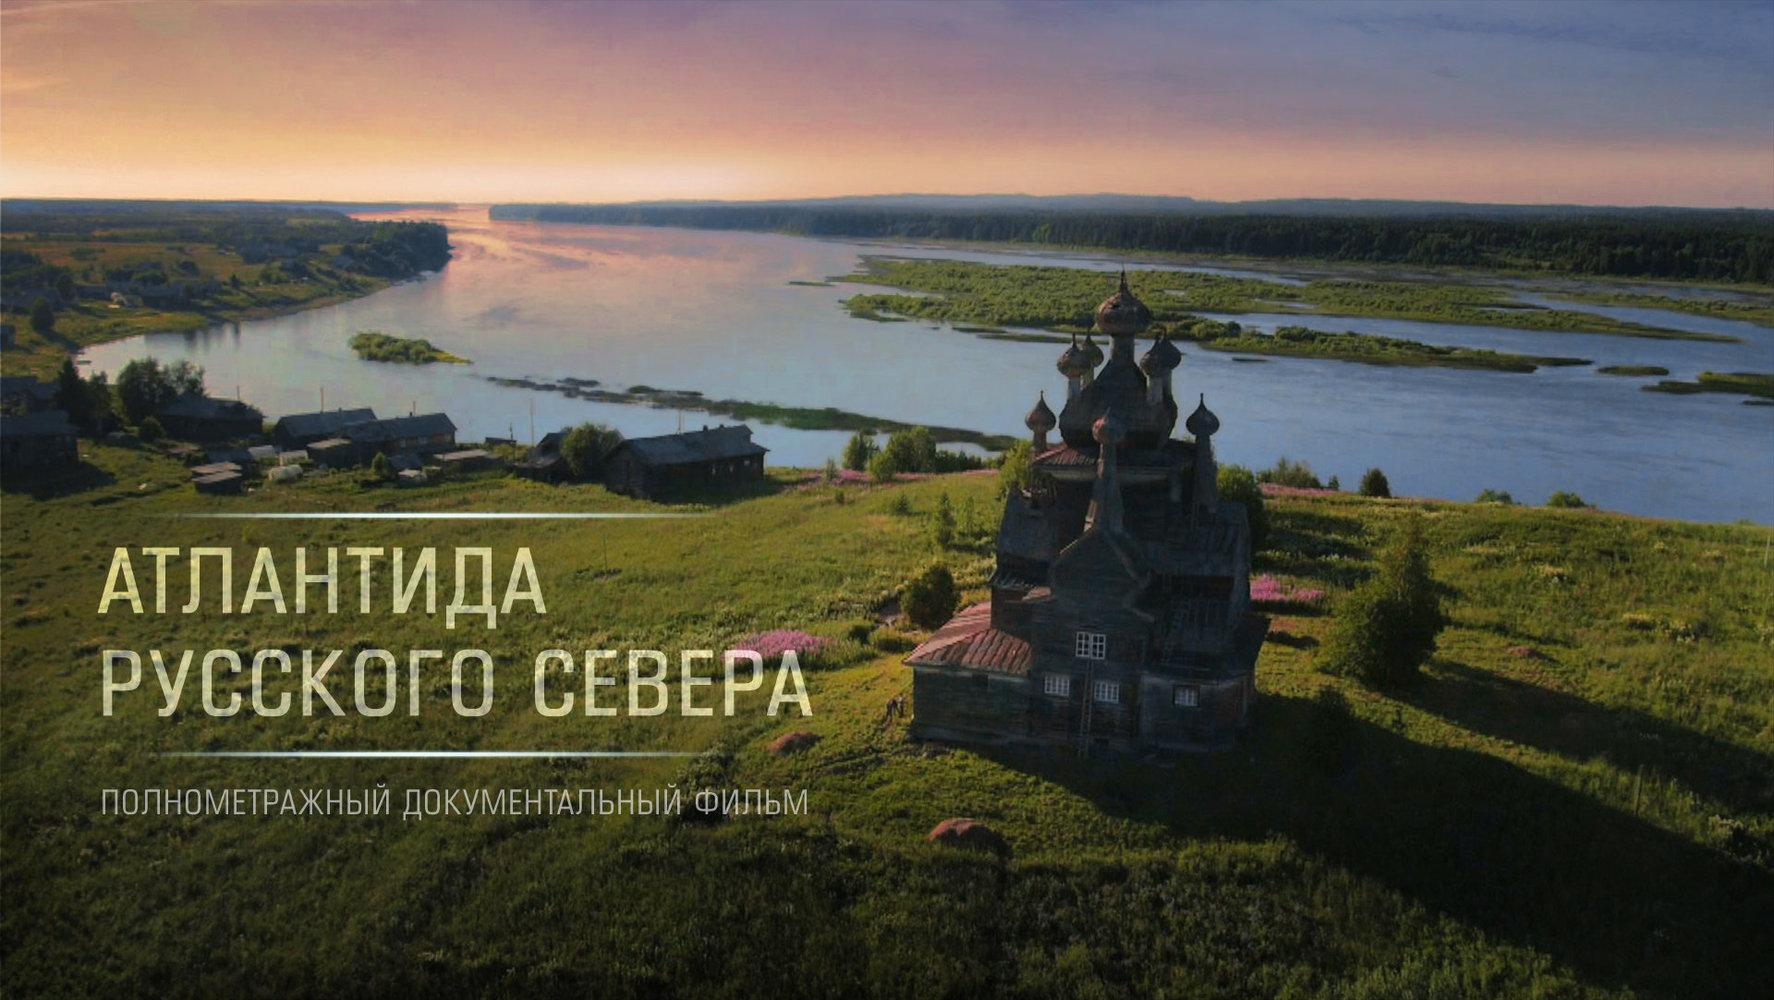 «Атлантиду Русского Севера» покажут на фестивале VOICES в Вологде